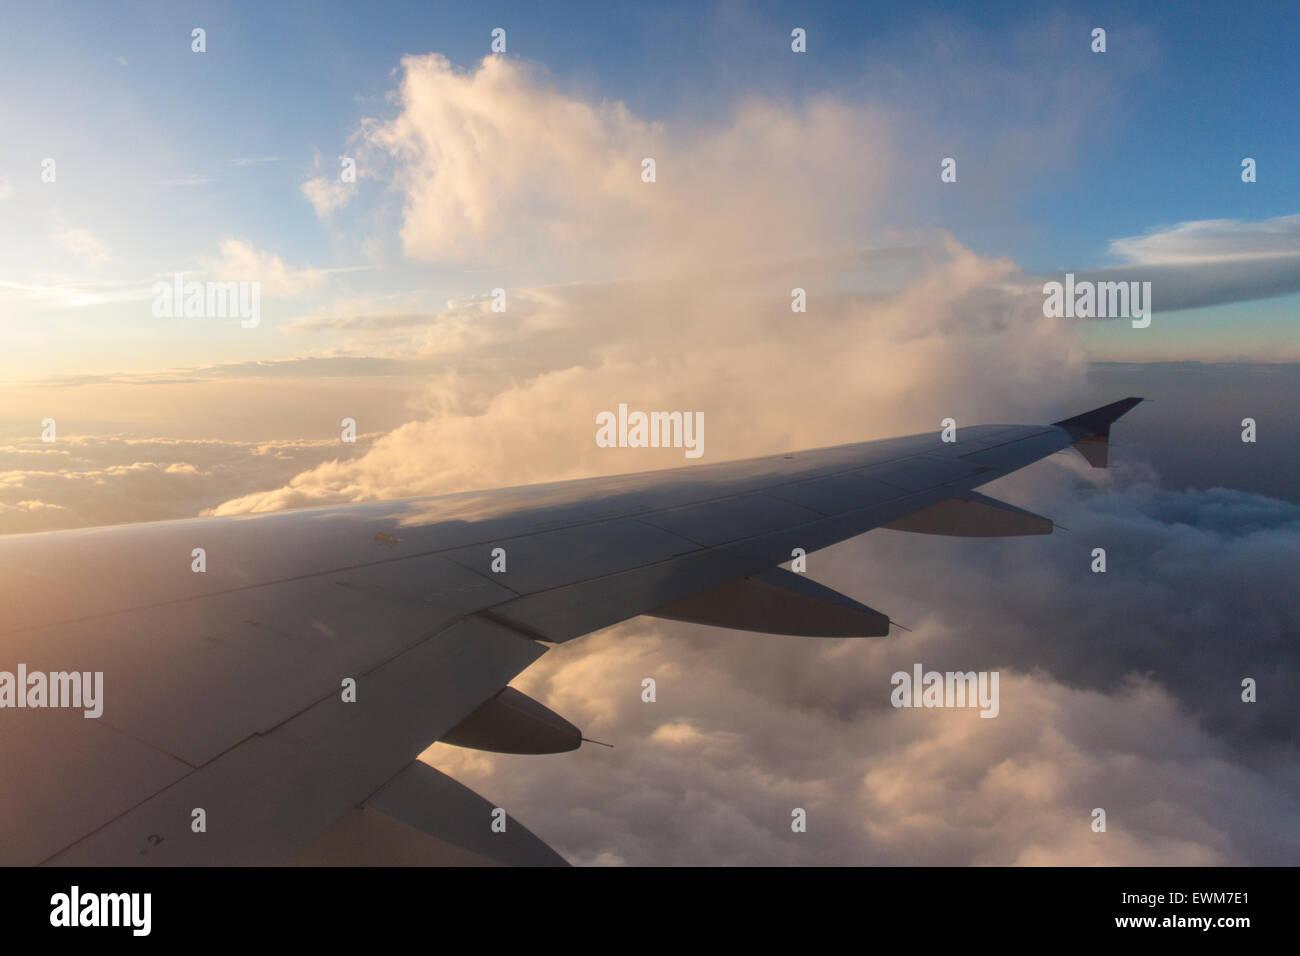 The sun illuminates clouds near an airplane wing. - Stock Image